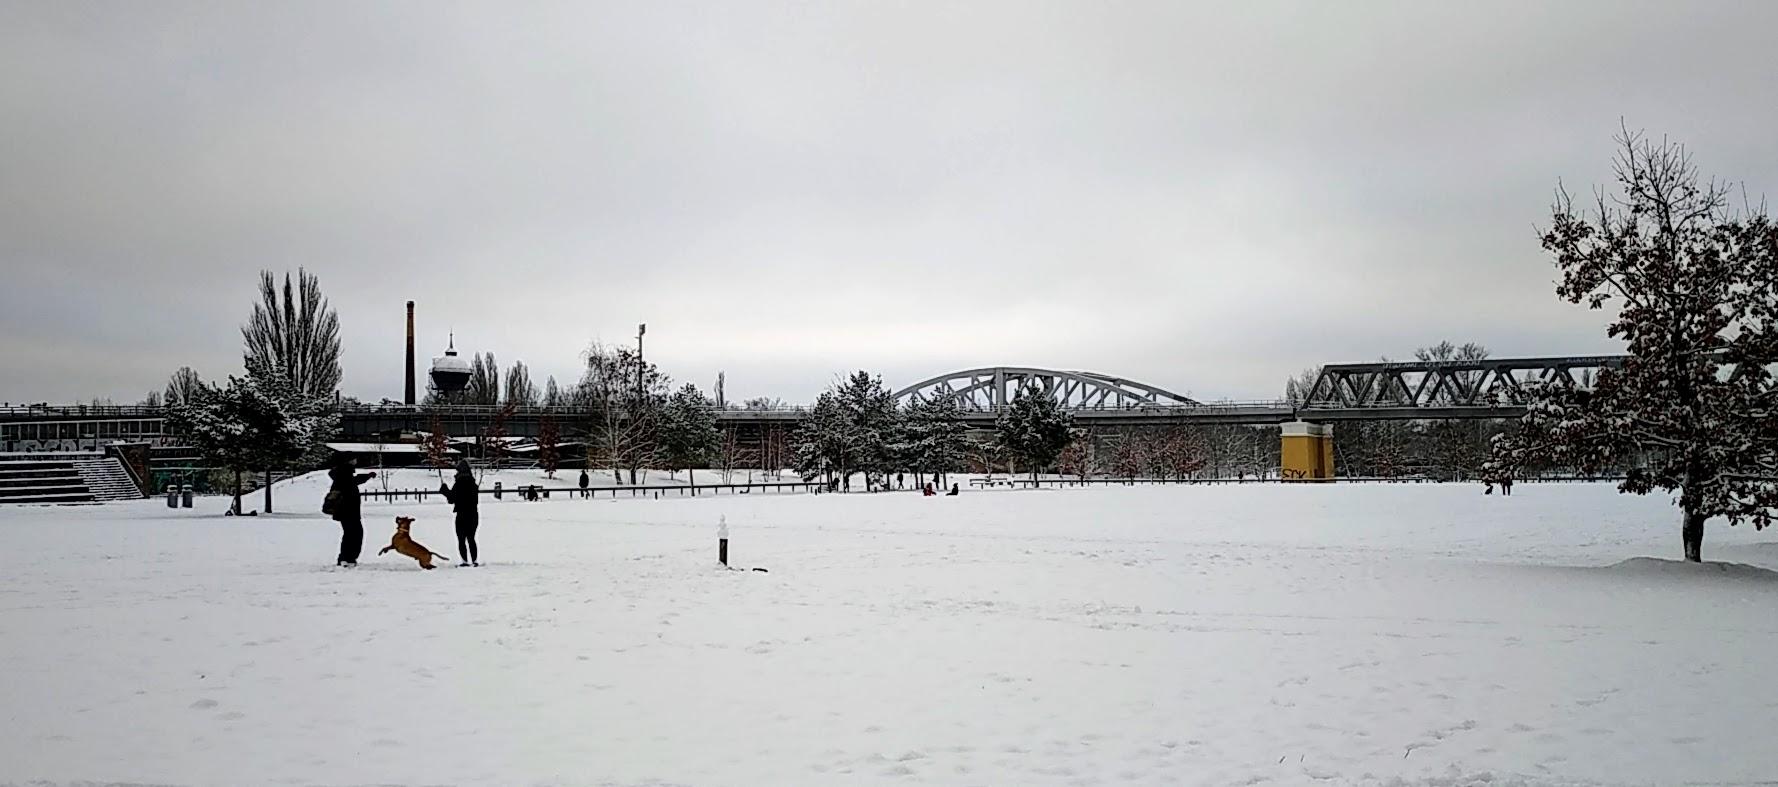 Eisheiligen 2021 Berlin